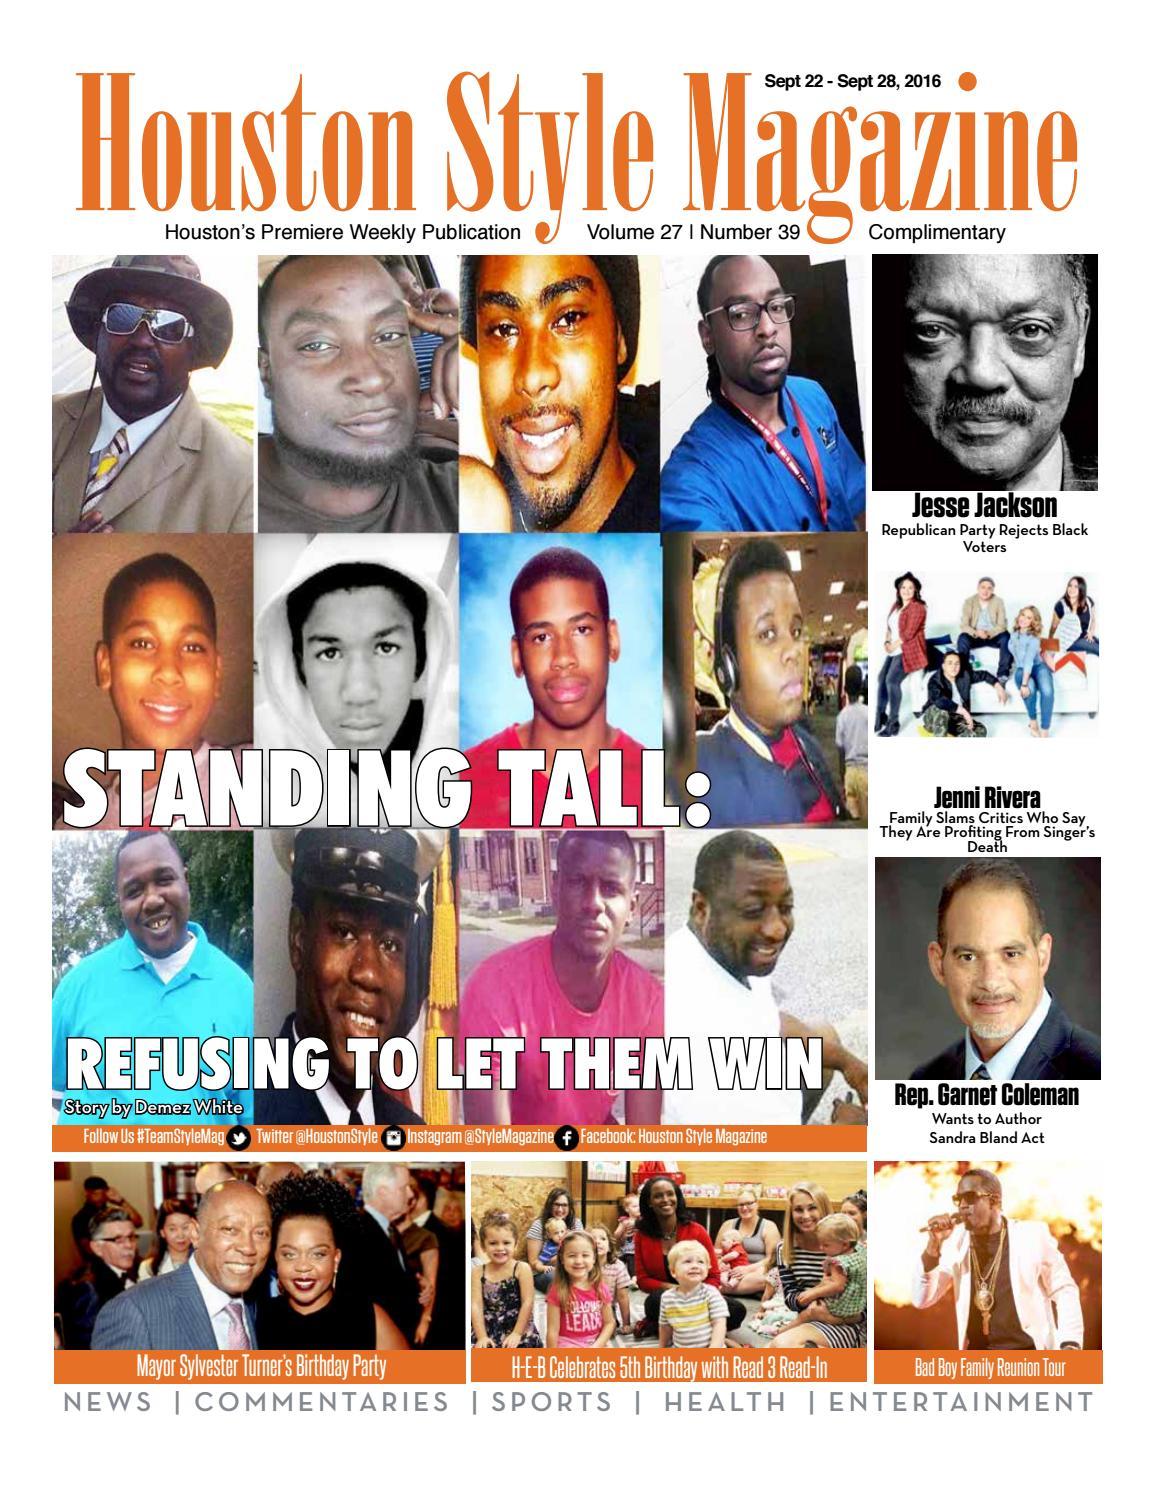 Houston Style Magazine vol 27 No 39 by Houston Style Magazine - issuu